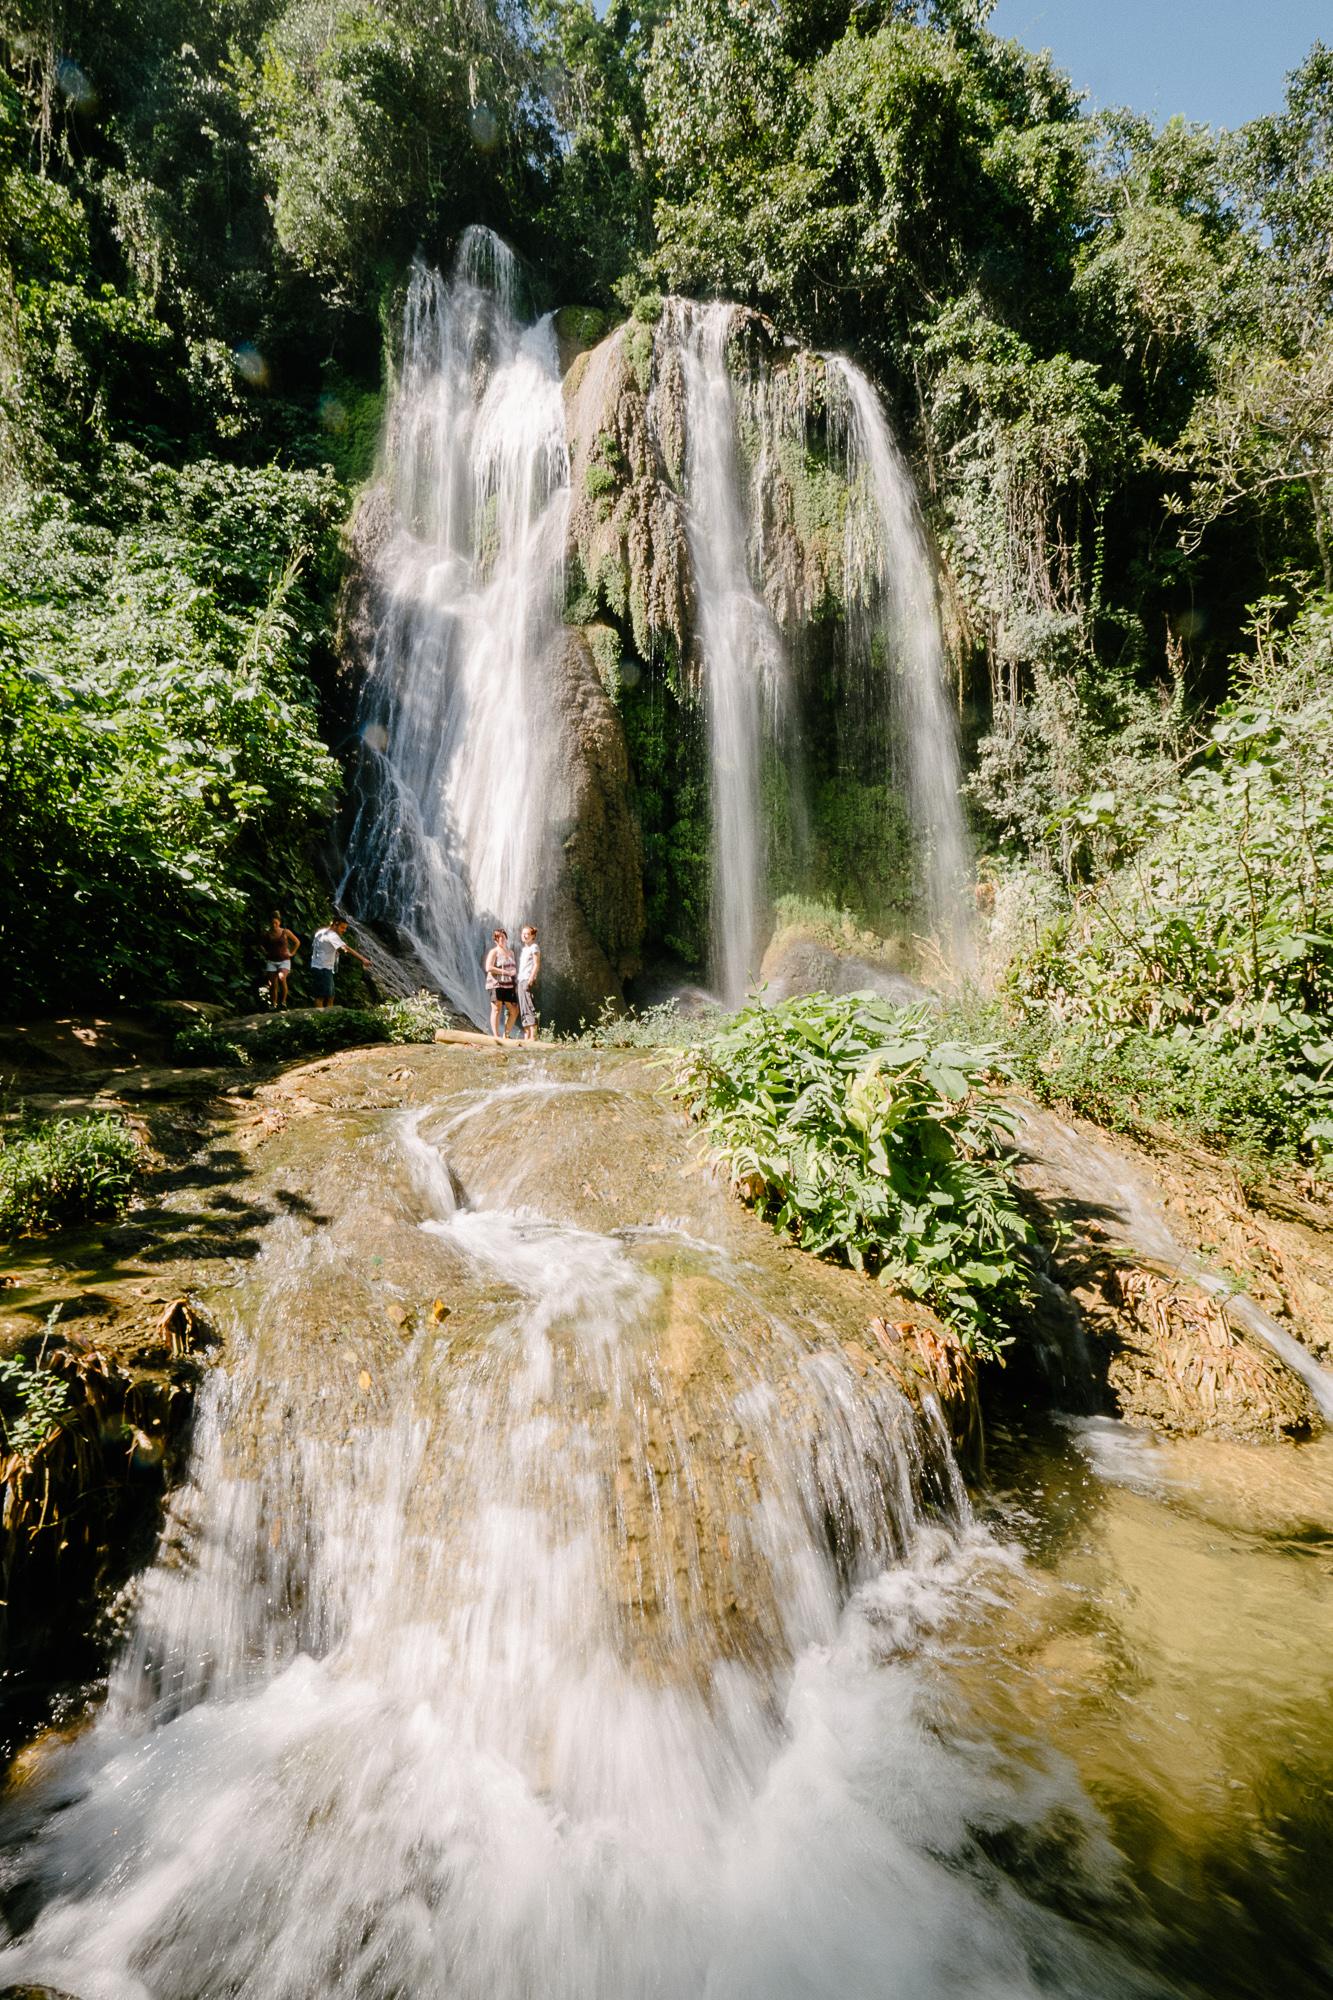 cuba-trinidad-hiking-waterfall-salto-el-rocio.jpg